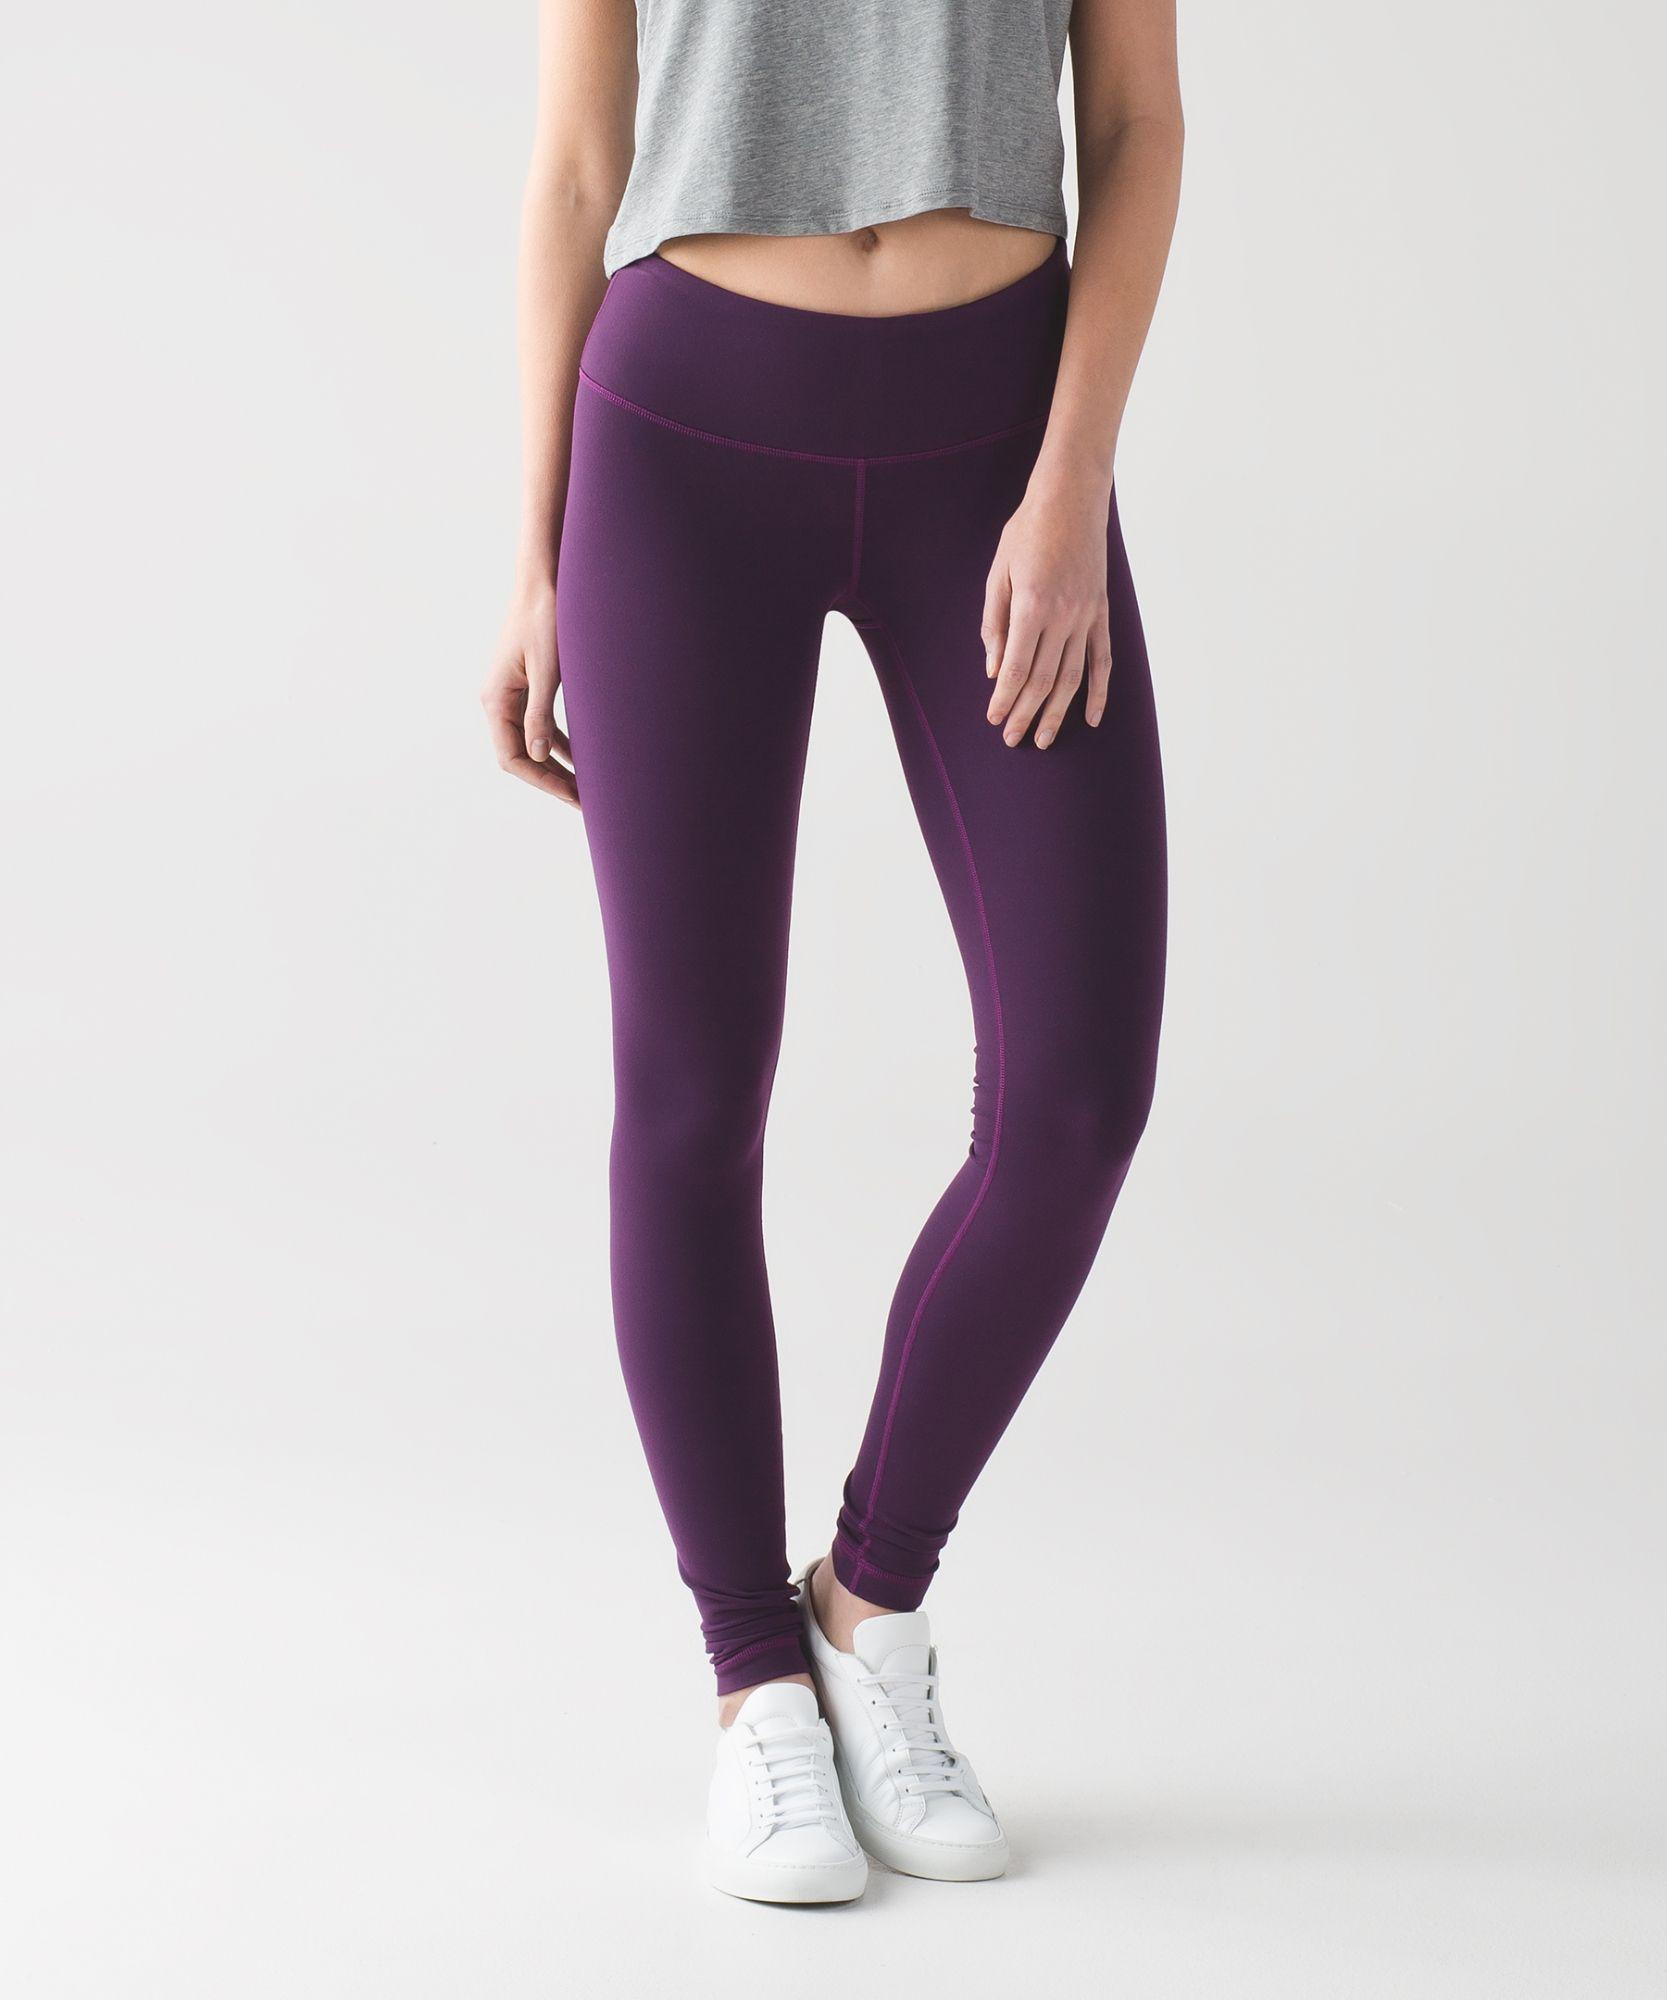 aefbbf9ed4227 Women's Yoga Pants - Wunder Under Pant III *Full-On Luon - lululemon ...